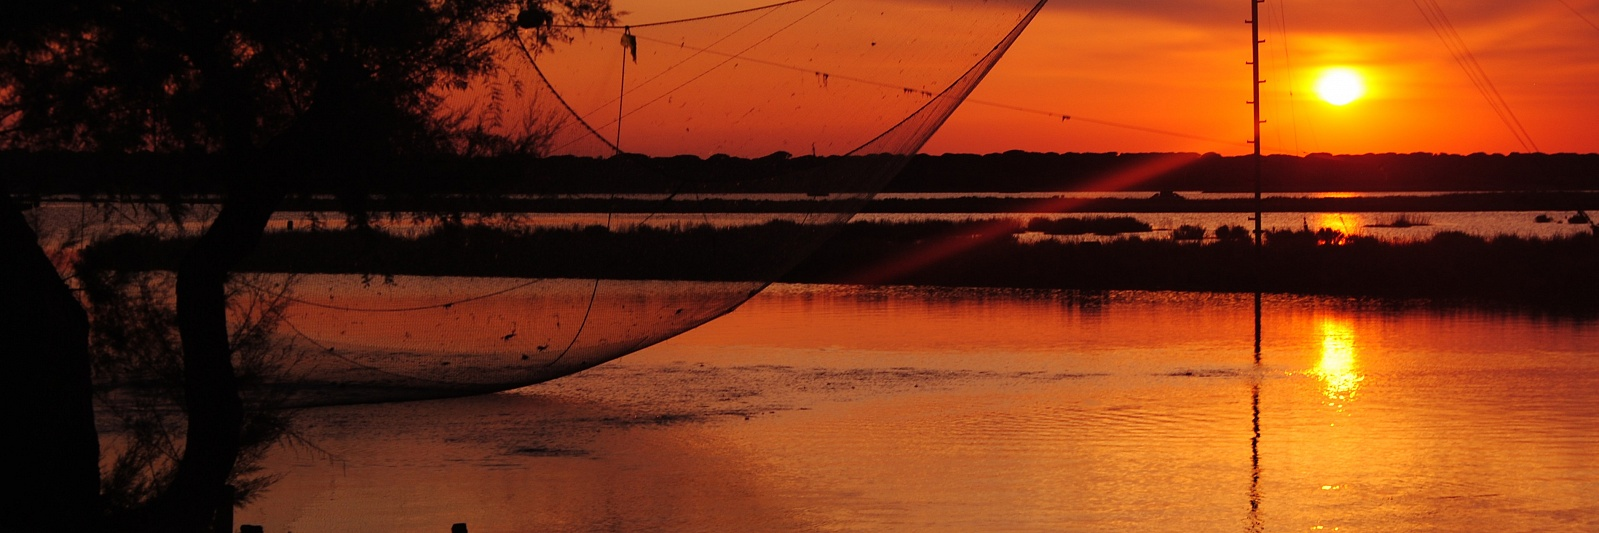 Pesca e Tramonto - Piallassa Story